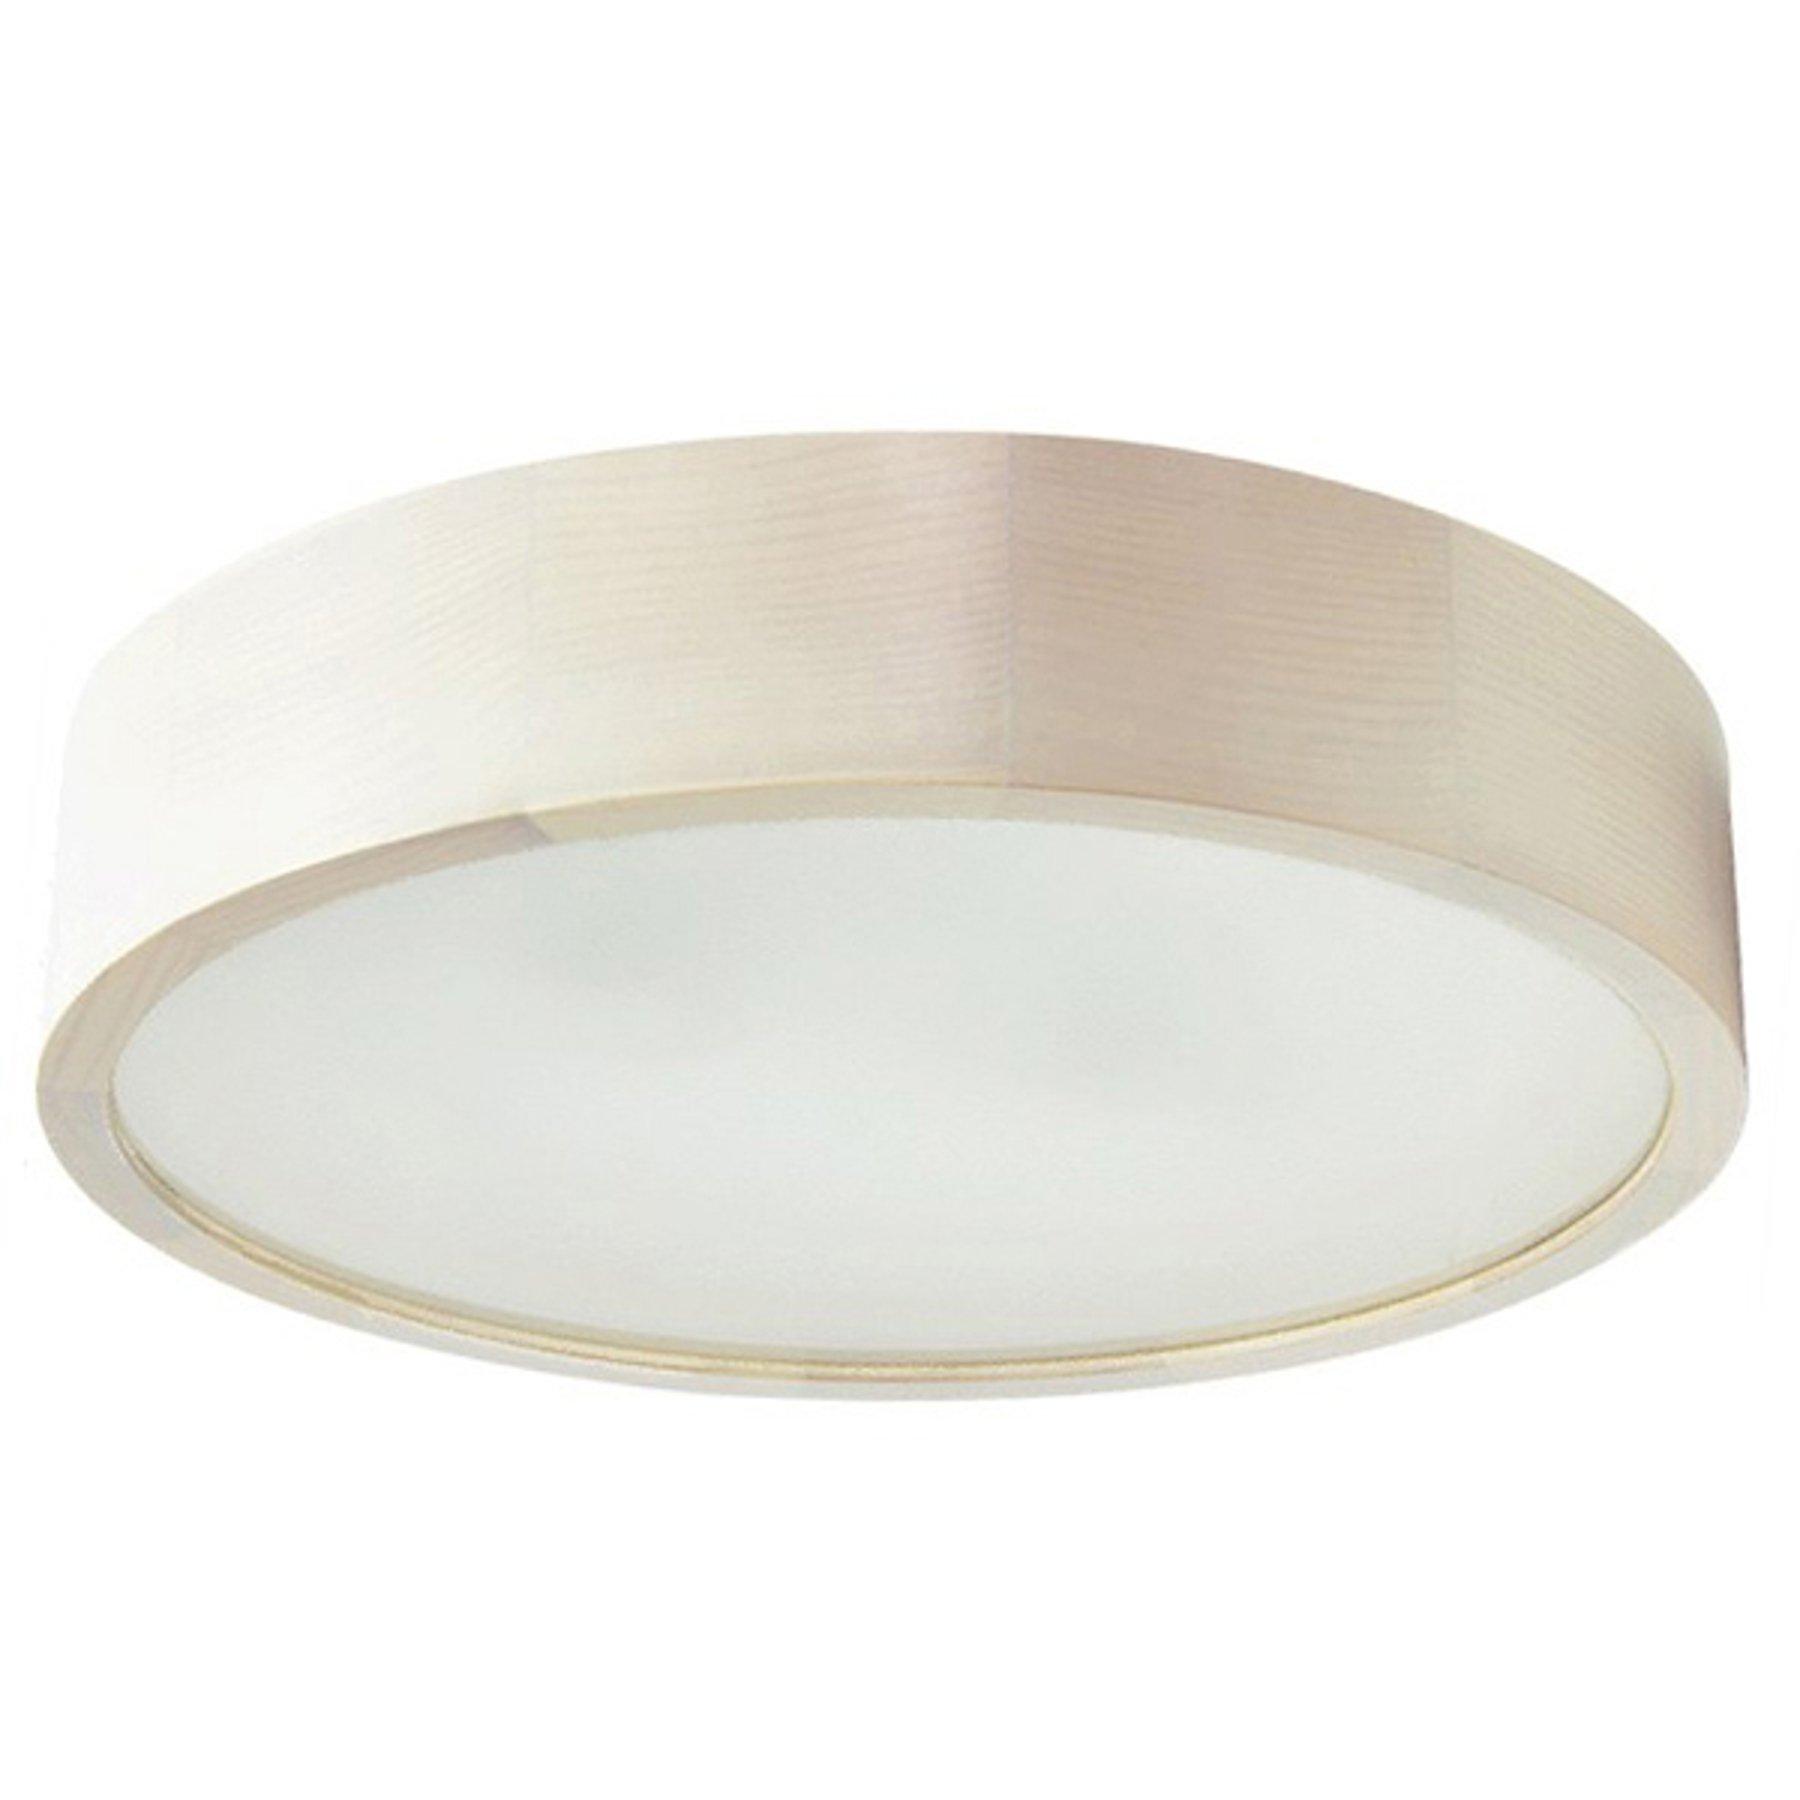 LED-taklampe Cleo, Ø 28 cm, hvit